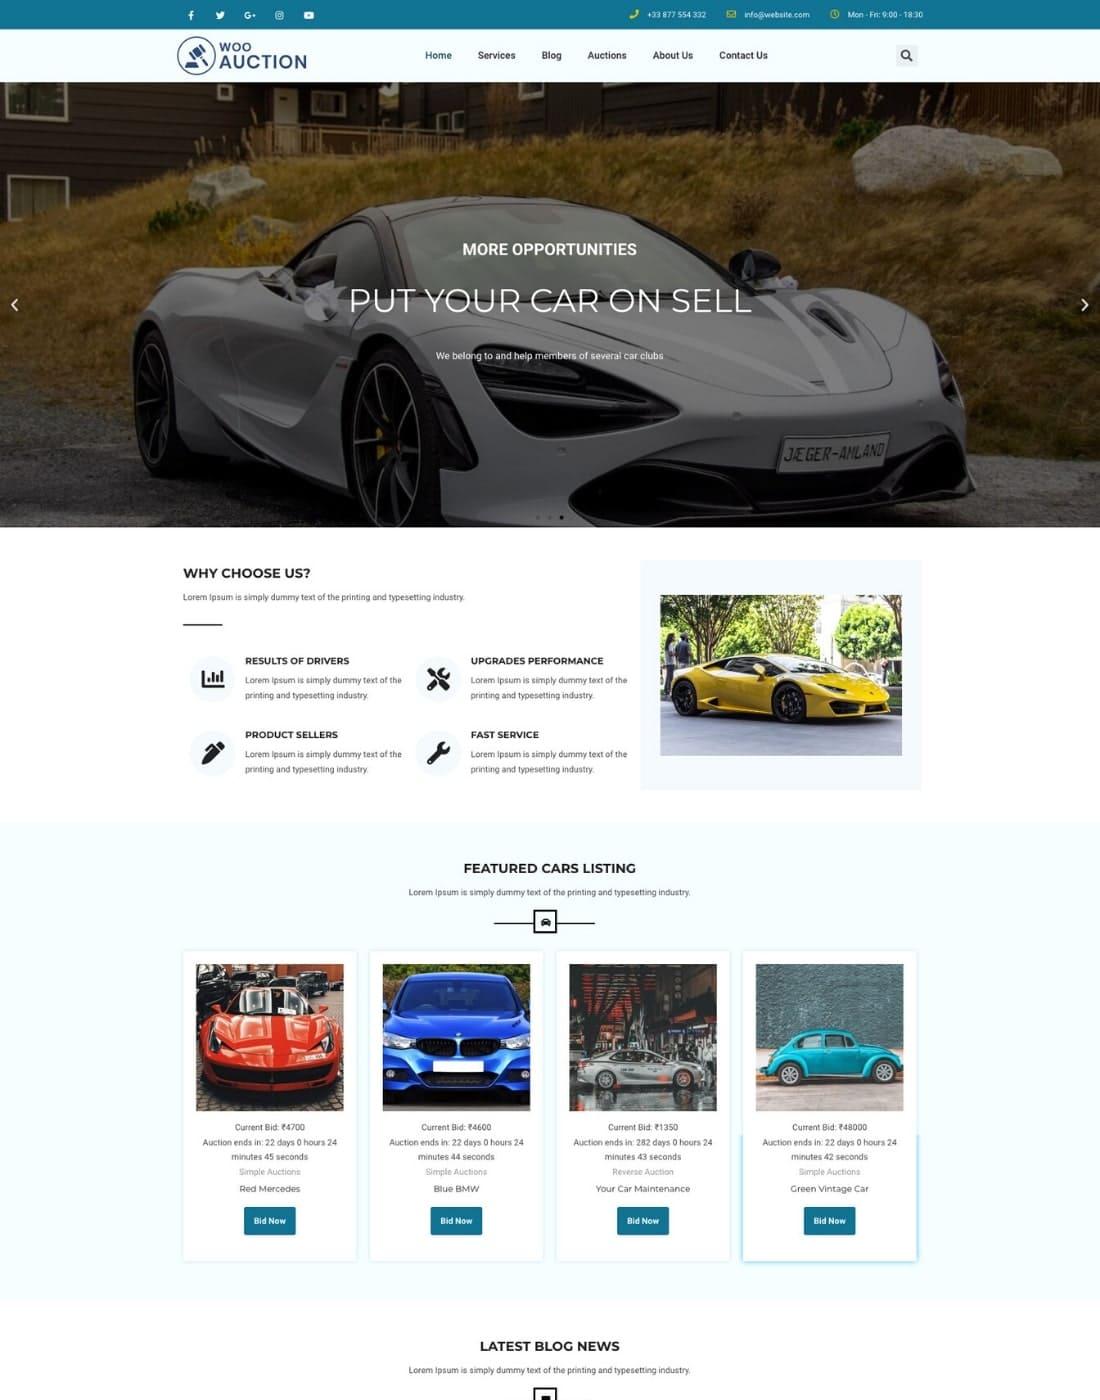 WordPress-Auction-Theme-min